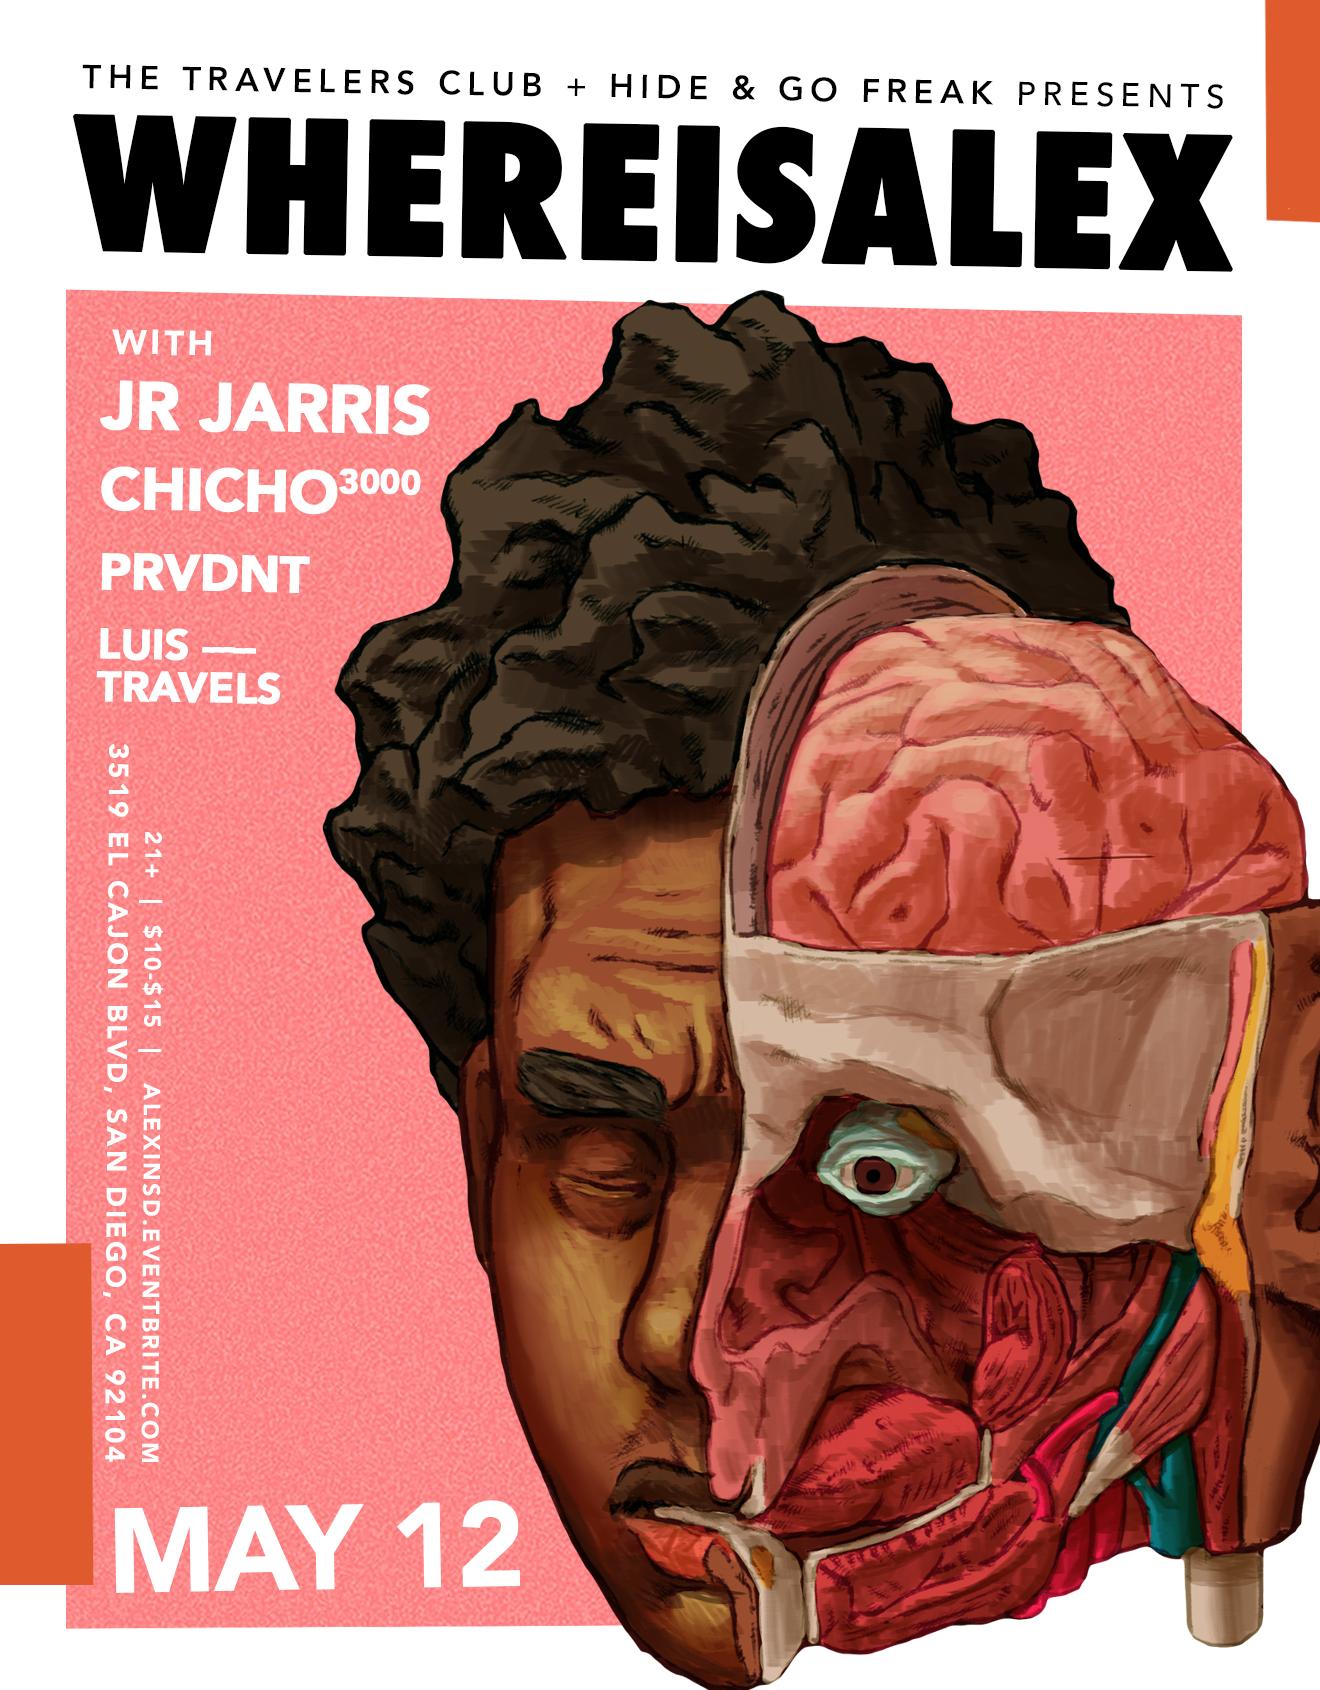 WHEREISALEX - San Diego - The Travelers Club